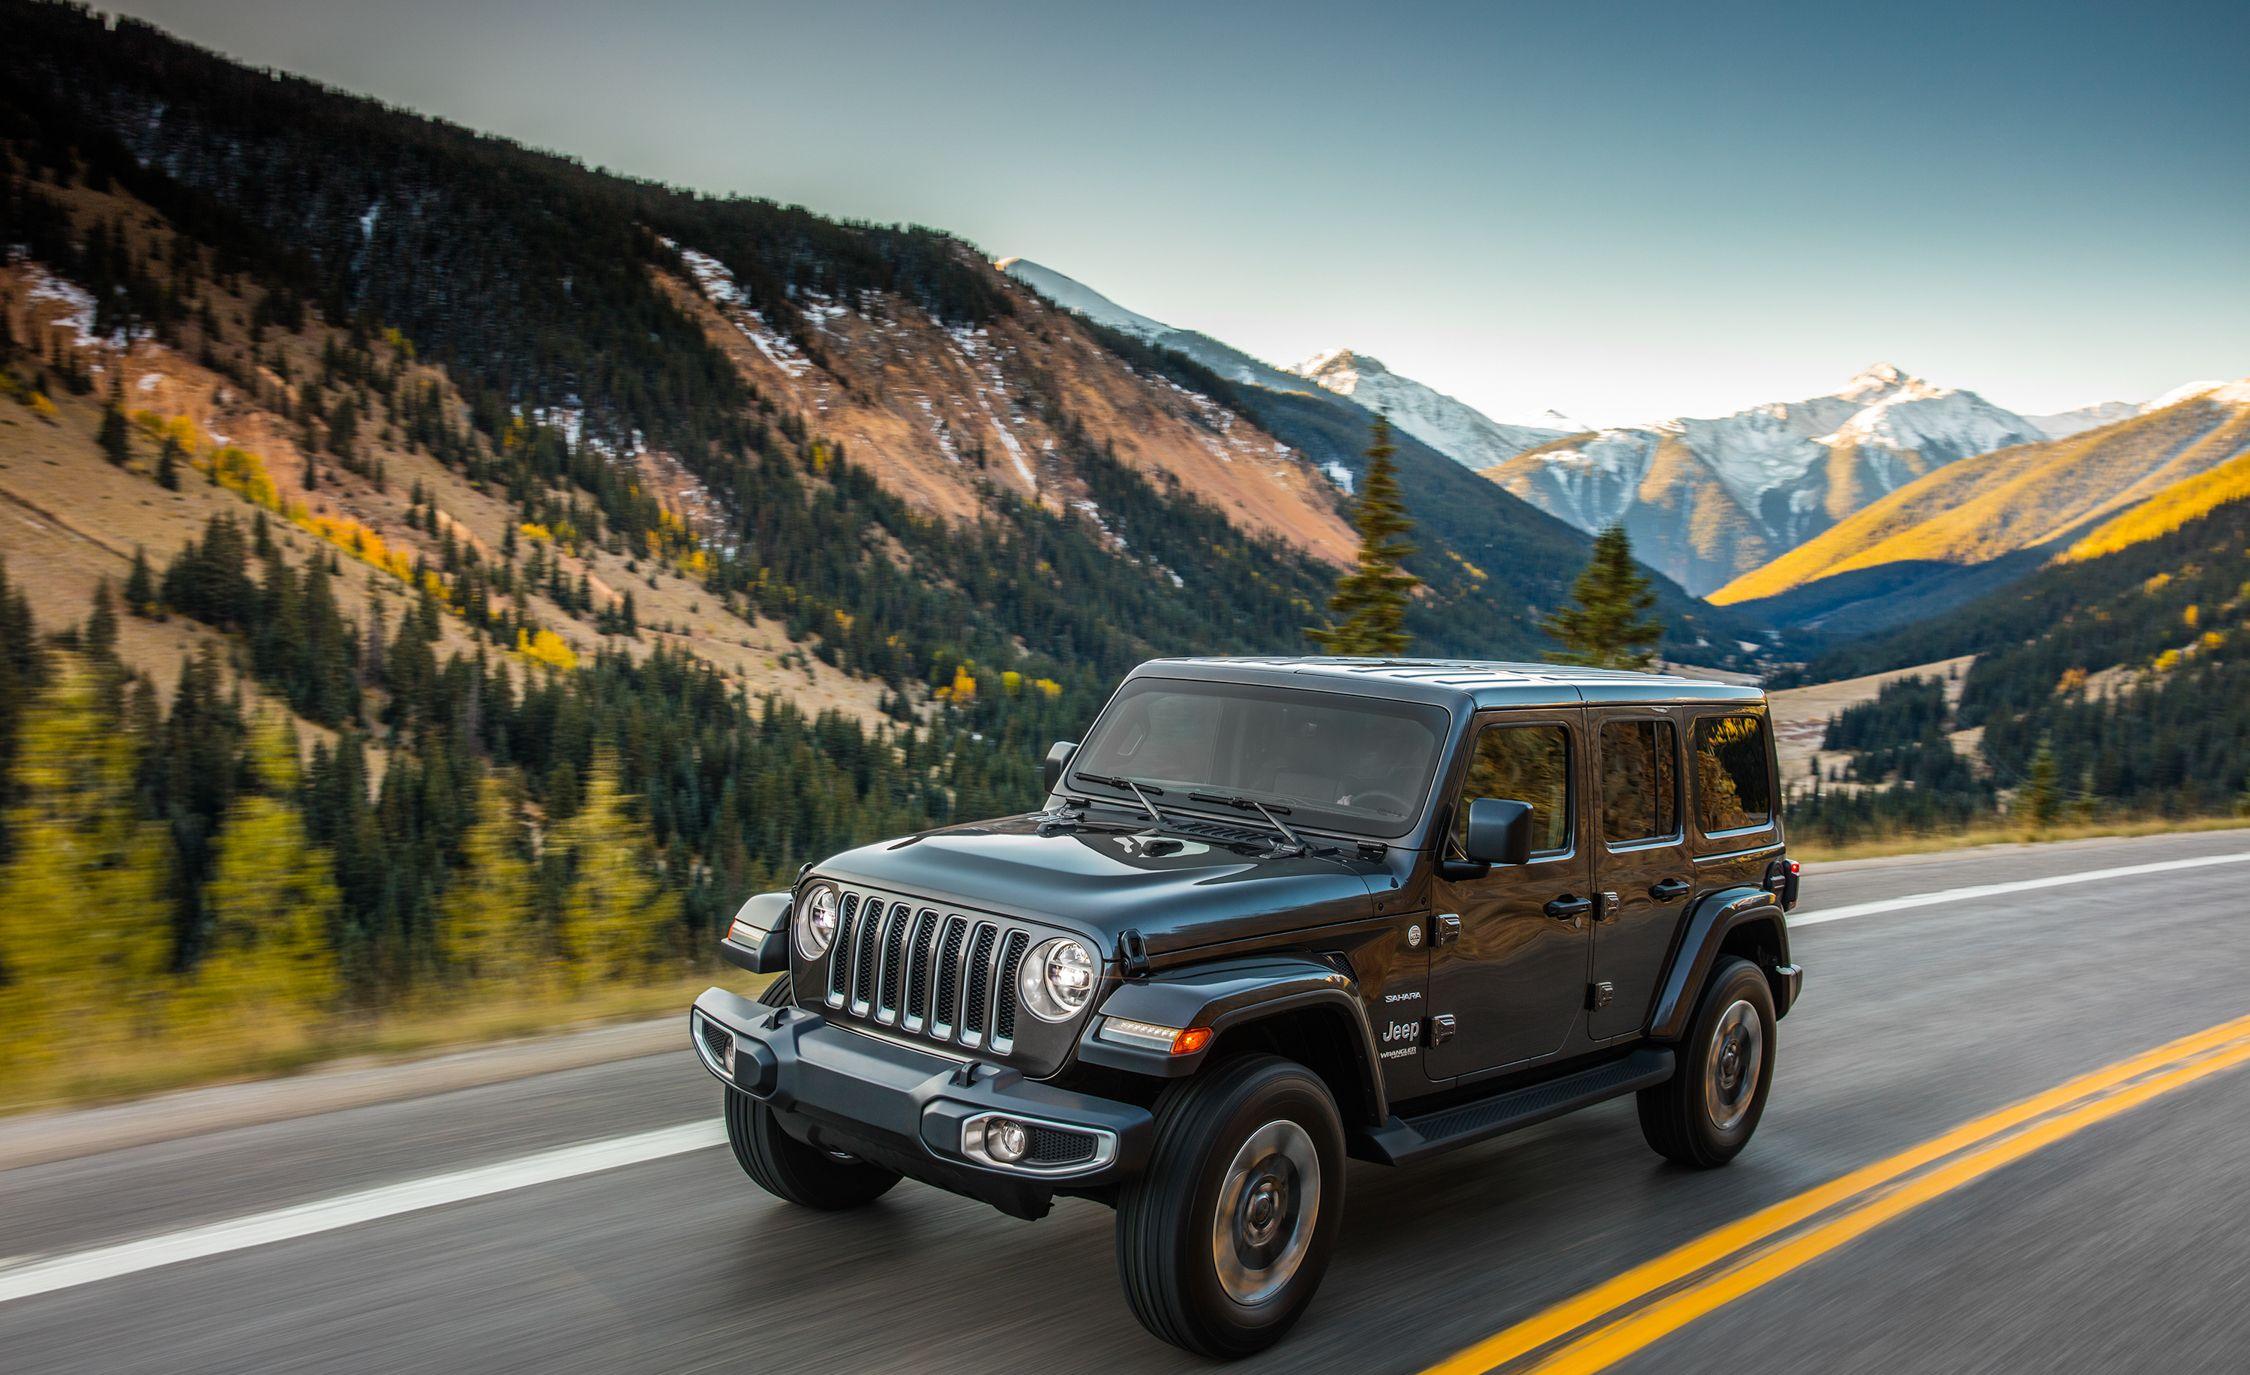 https://hips.hearstapps.com/amv-prod-cad-assets.s3.amazonaws.com/wp-content/uploads/2017/11/2018-Jeep-Wrangler-180-1.jpg